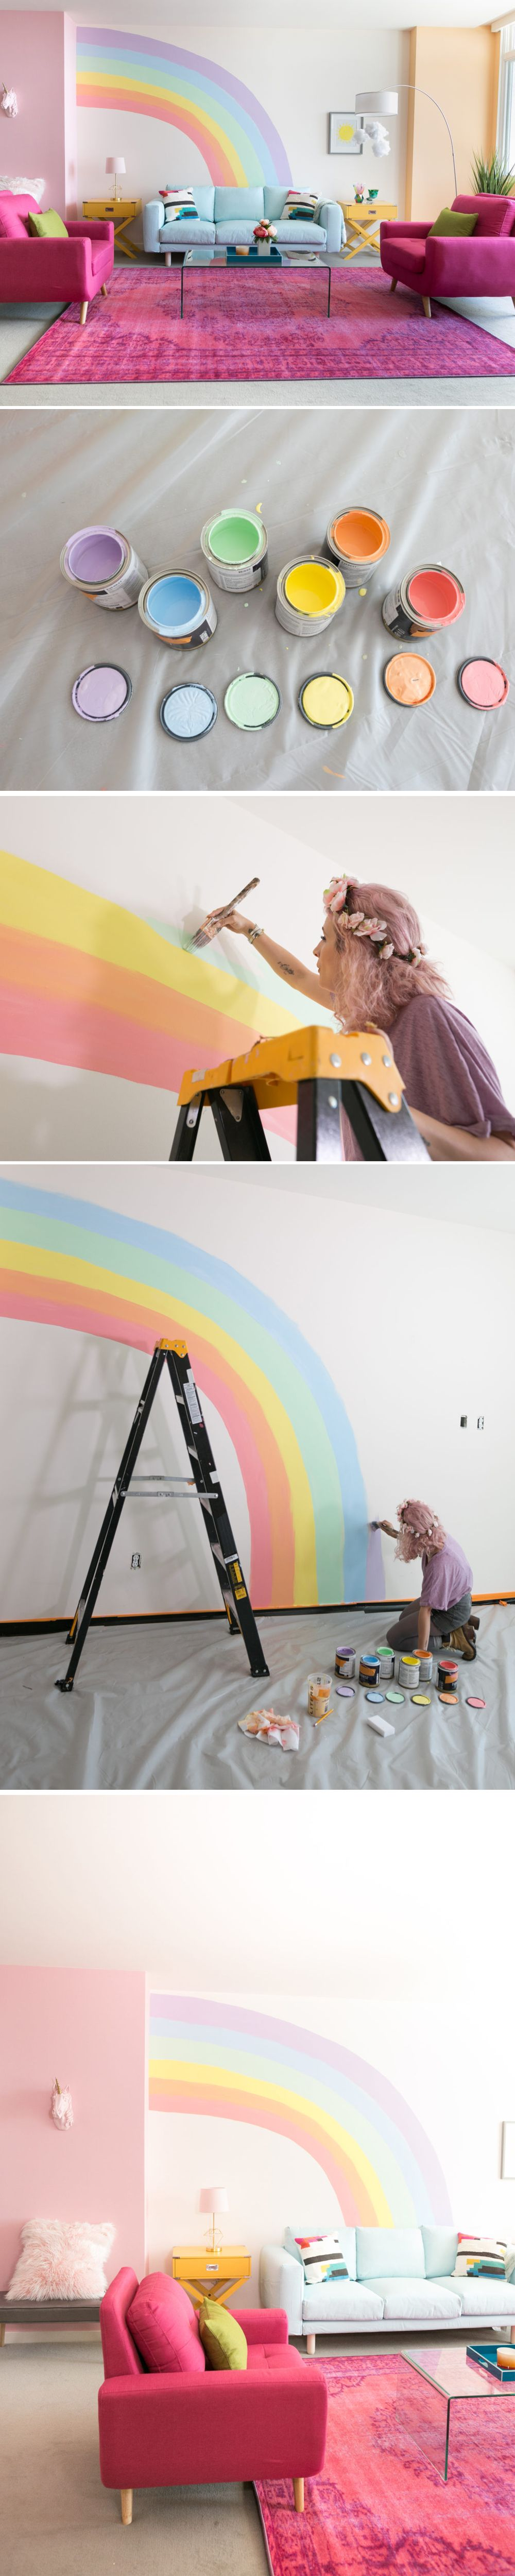 Diy watercolor mural wall bedrooms room and walls diy rainbow mural wall amipublicfo Image collections